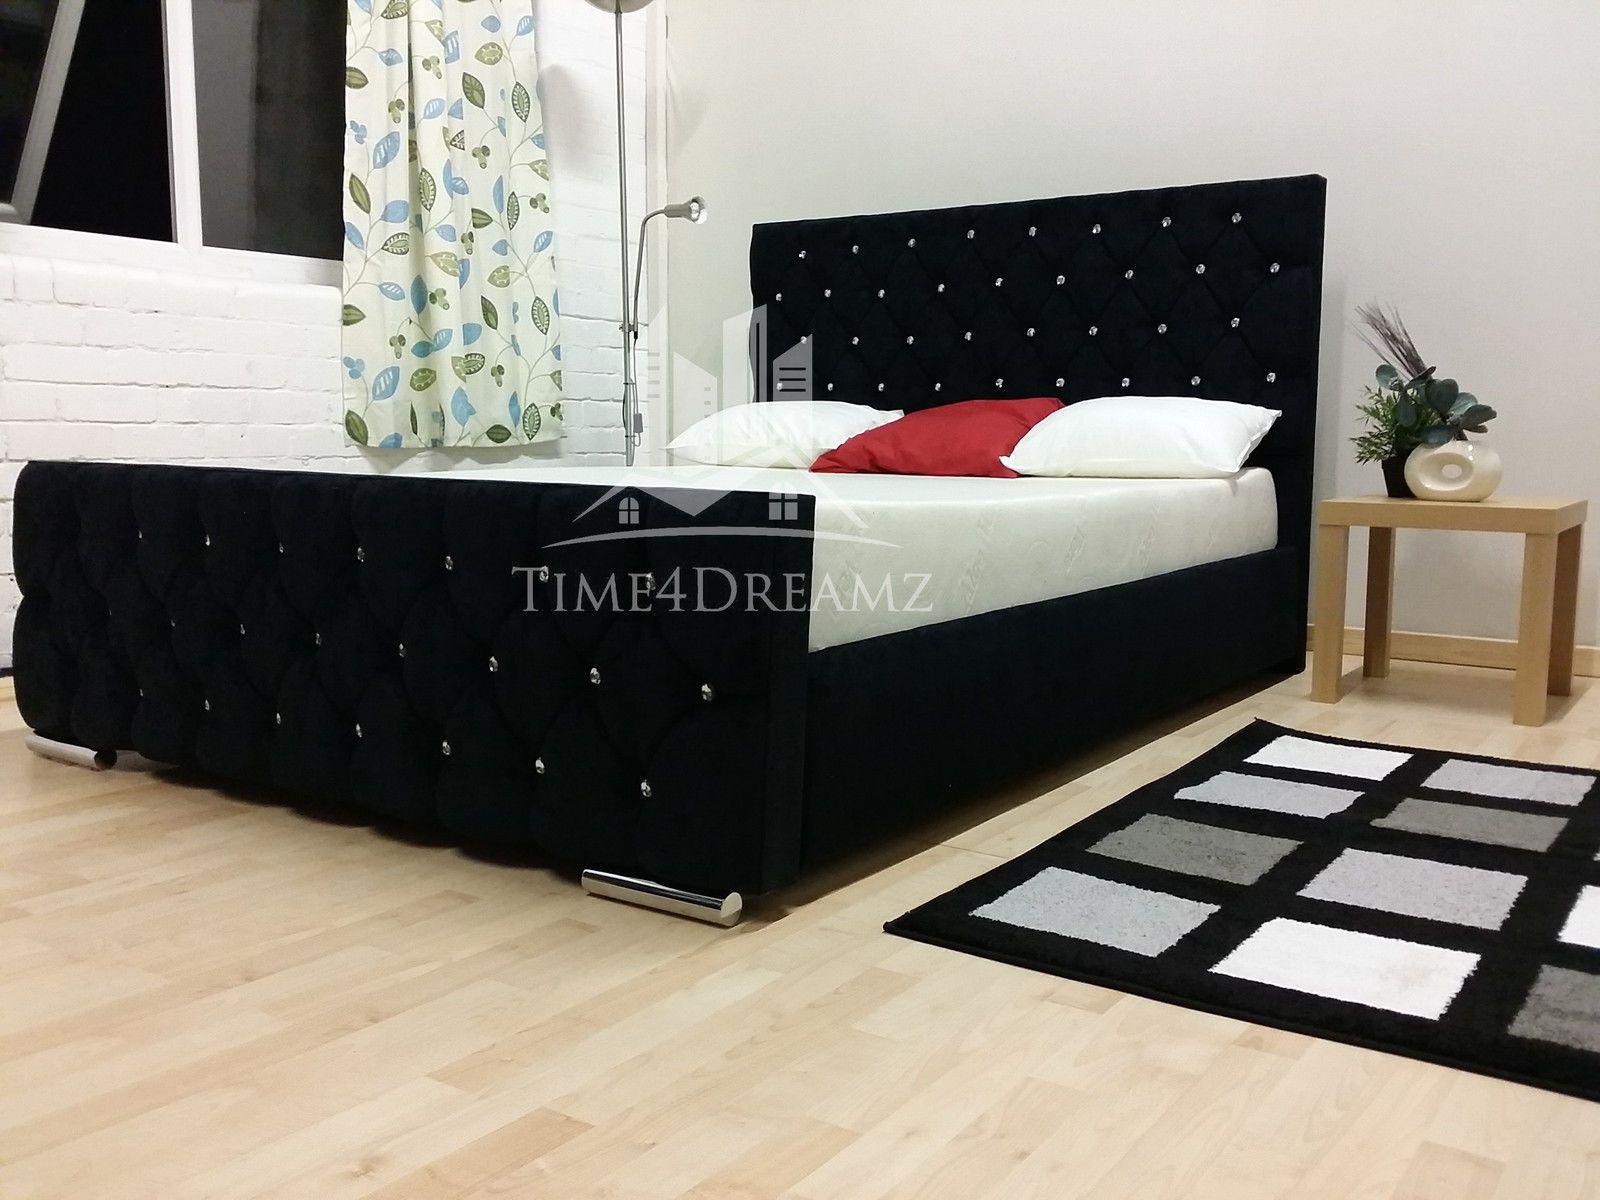 Details about Diamond Florida Teal Upholstered Bed Frame